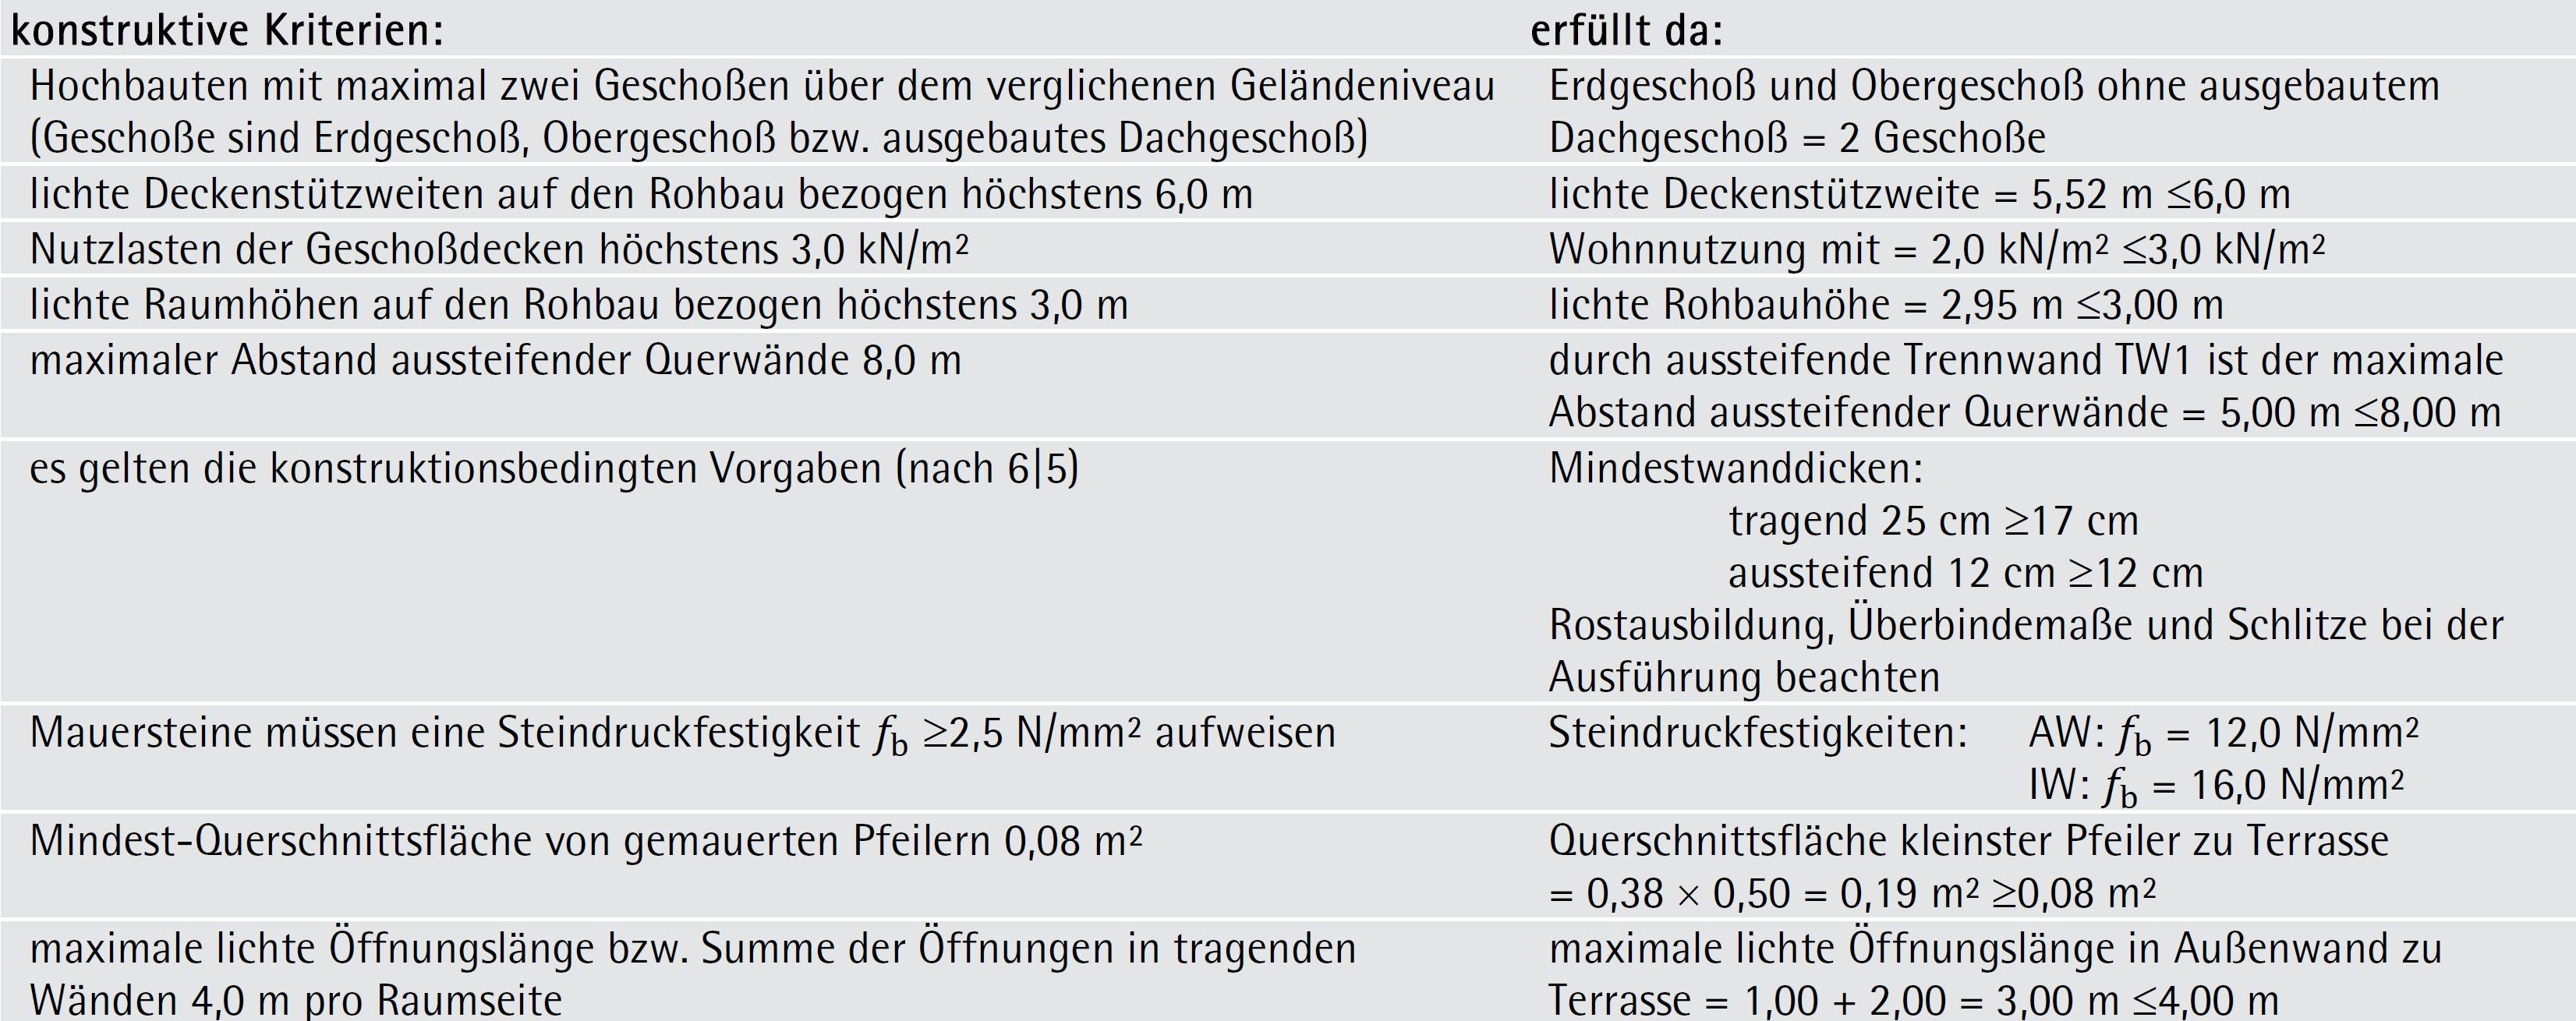 vertikaler Bemessungsnachweis nach konstruktiven Regeln – ÖNORM B 1996-3  (Teil 2/2)